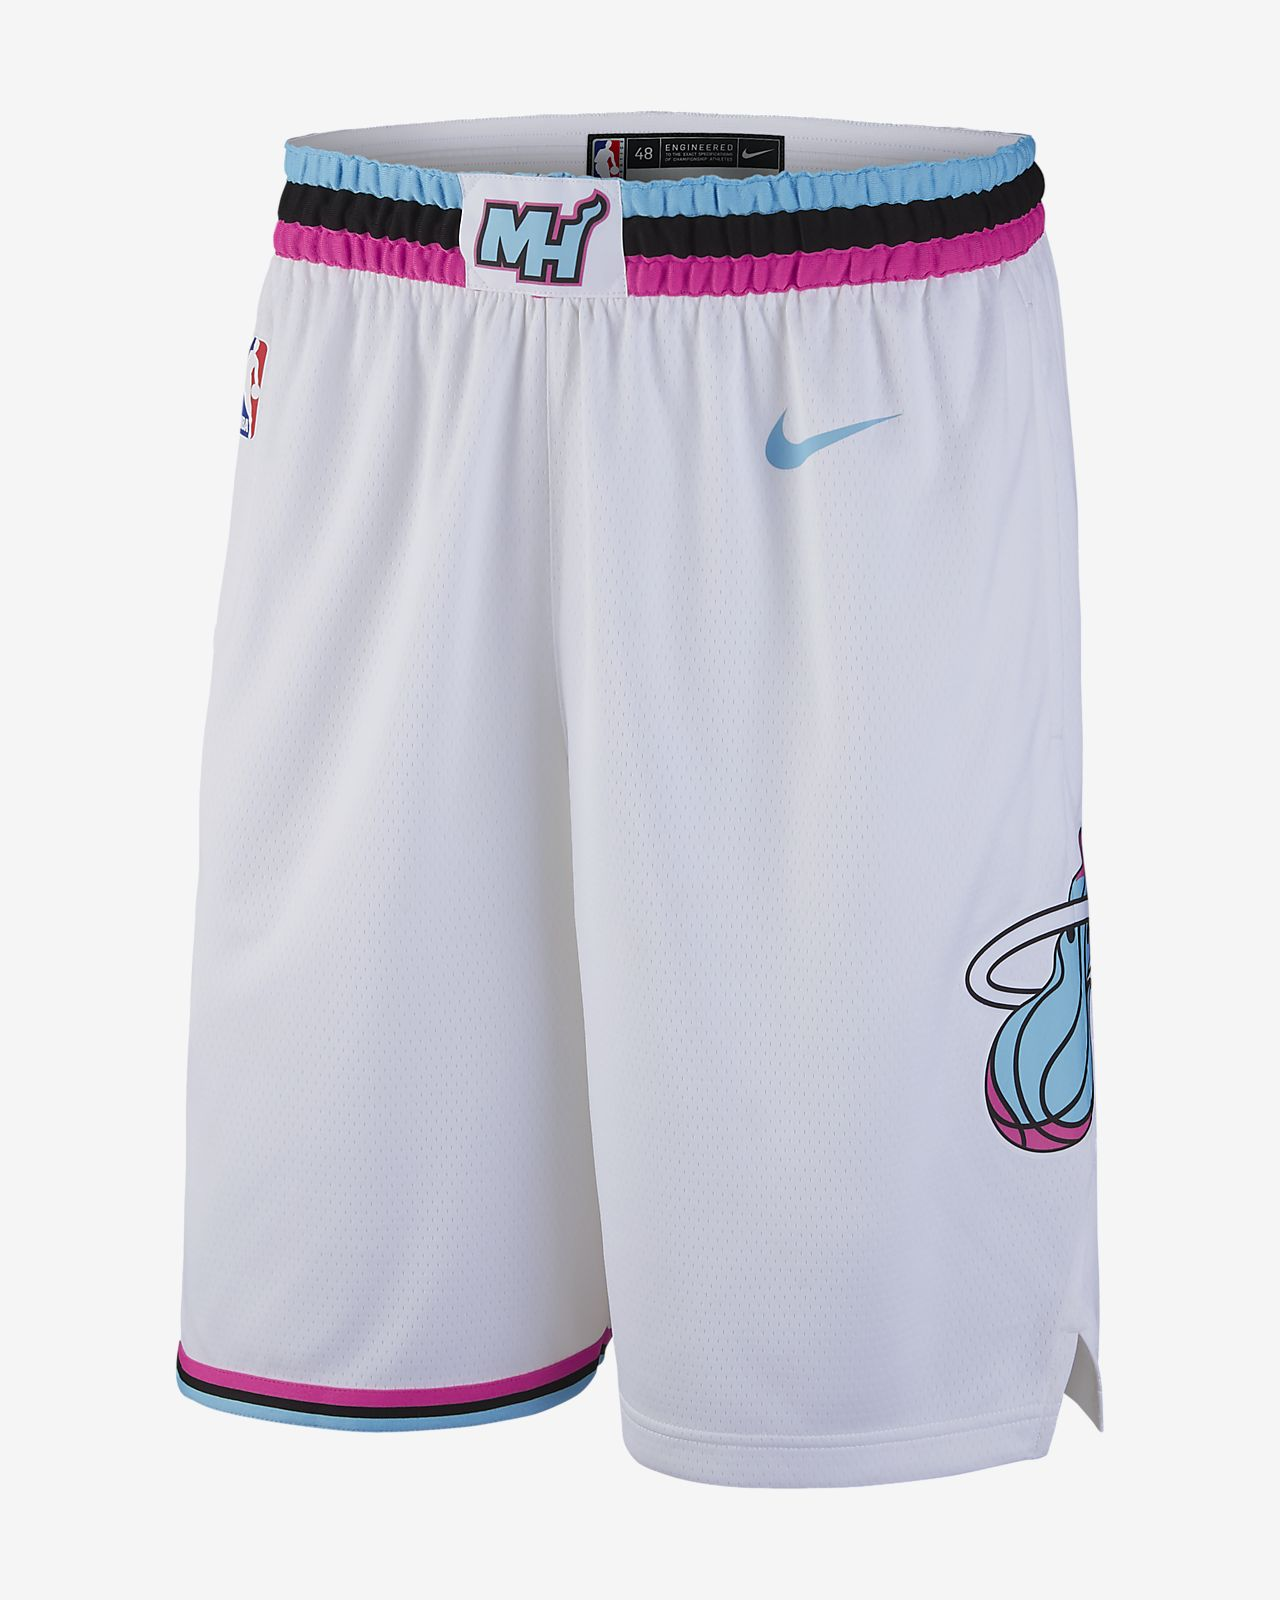 buy online 69679 10b89 Miami Heat City Jersey Shorts - Amnet